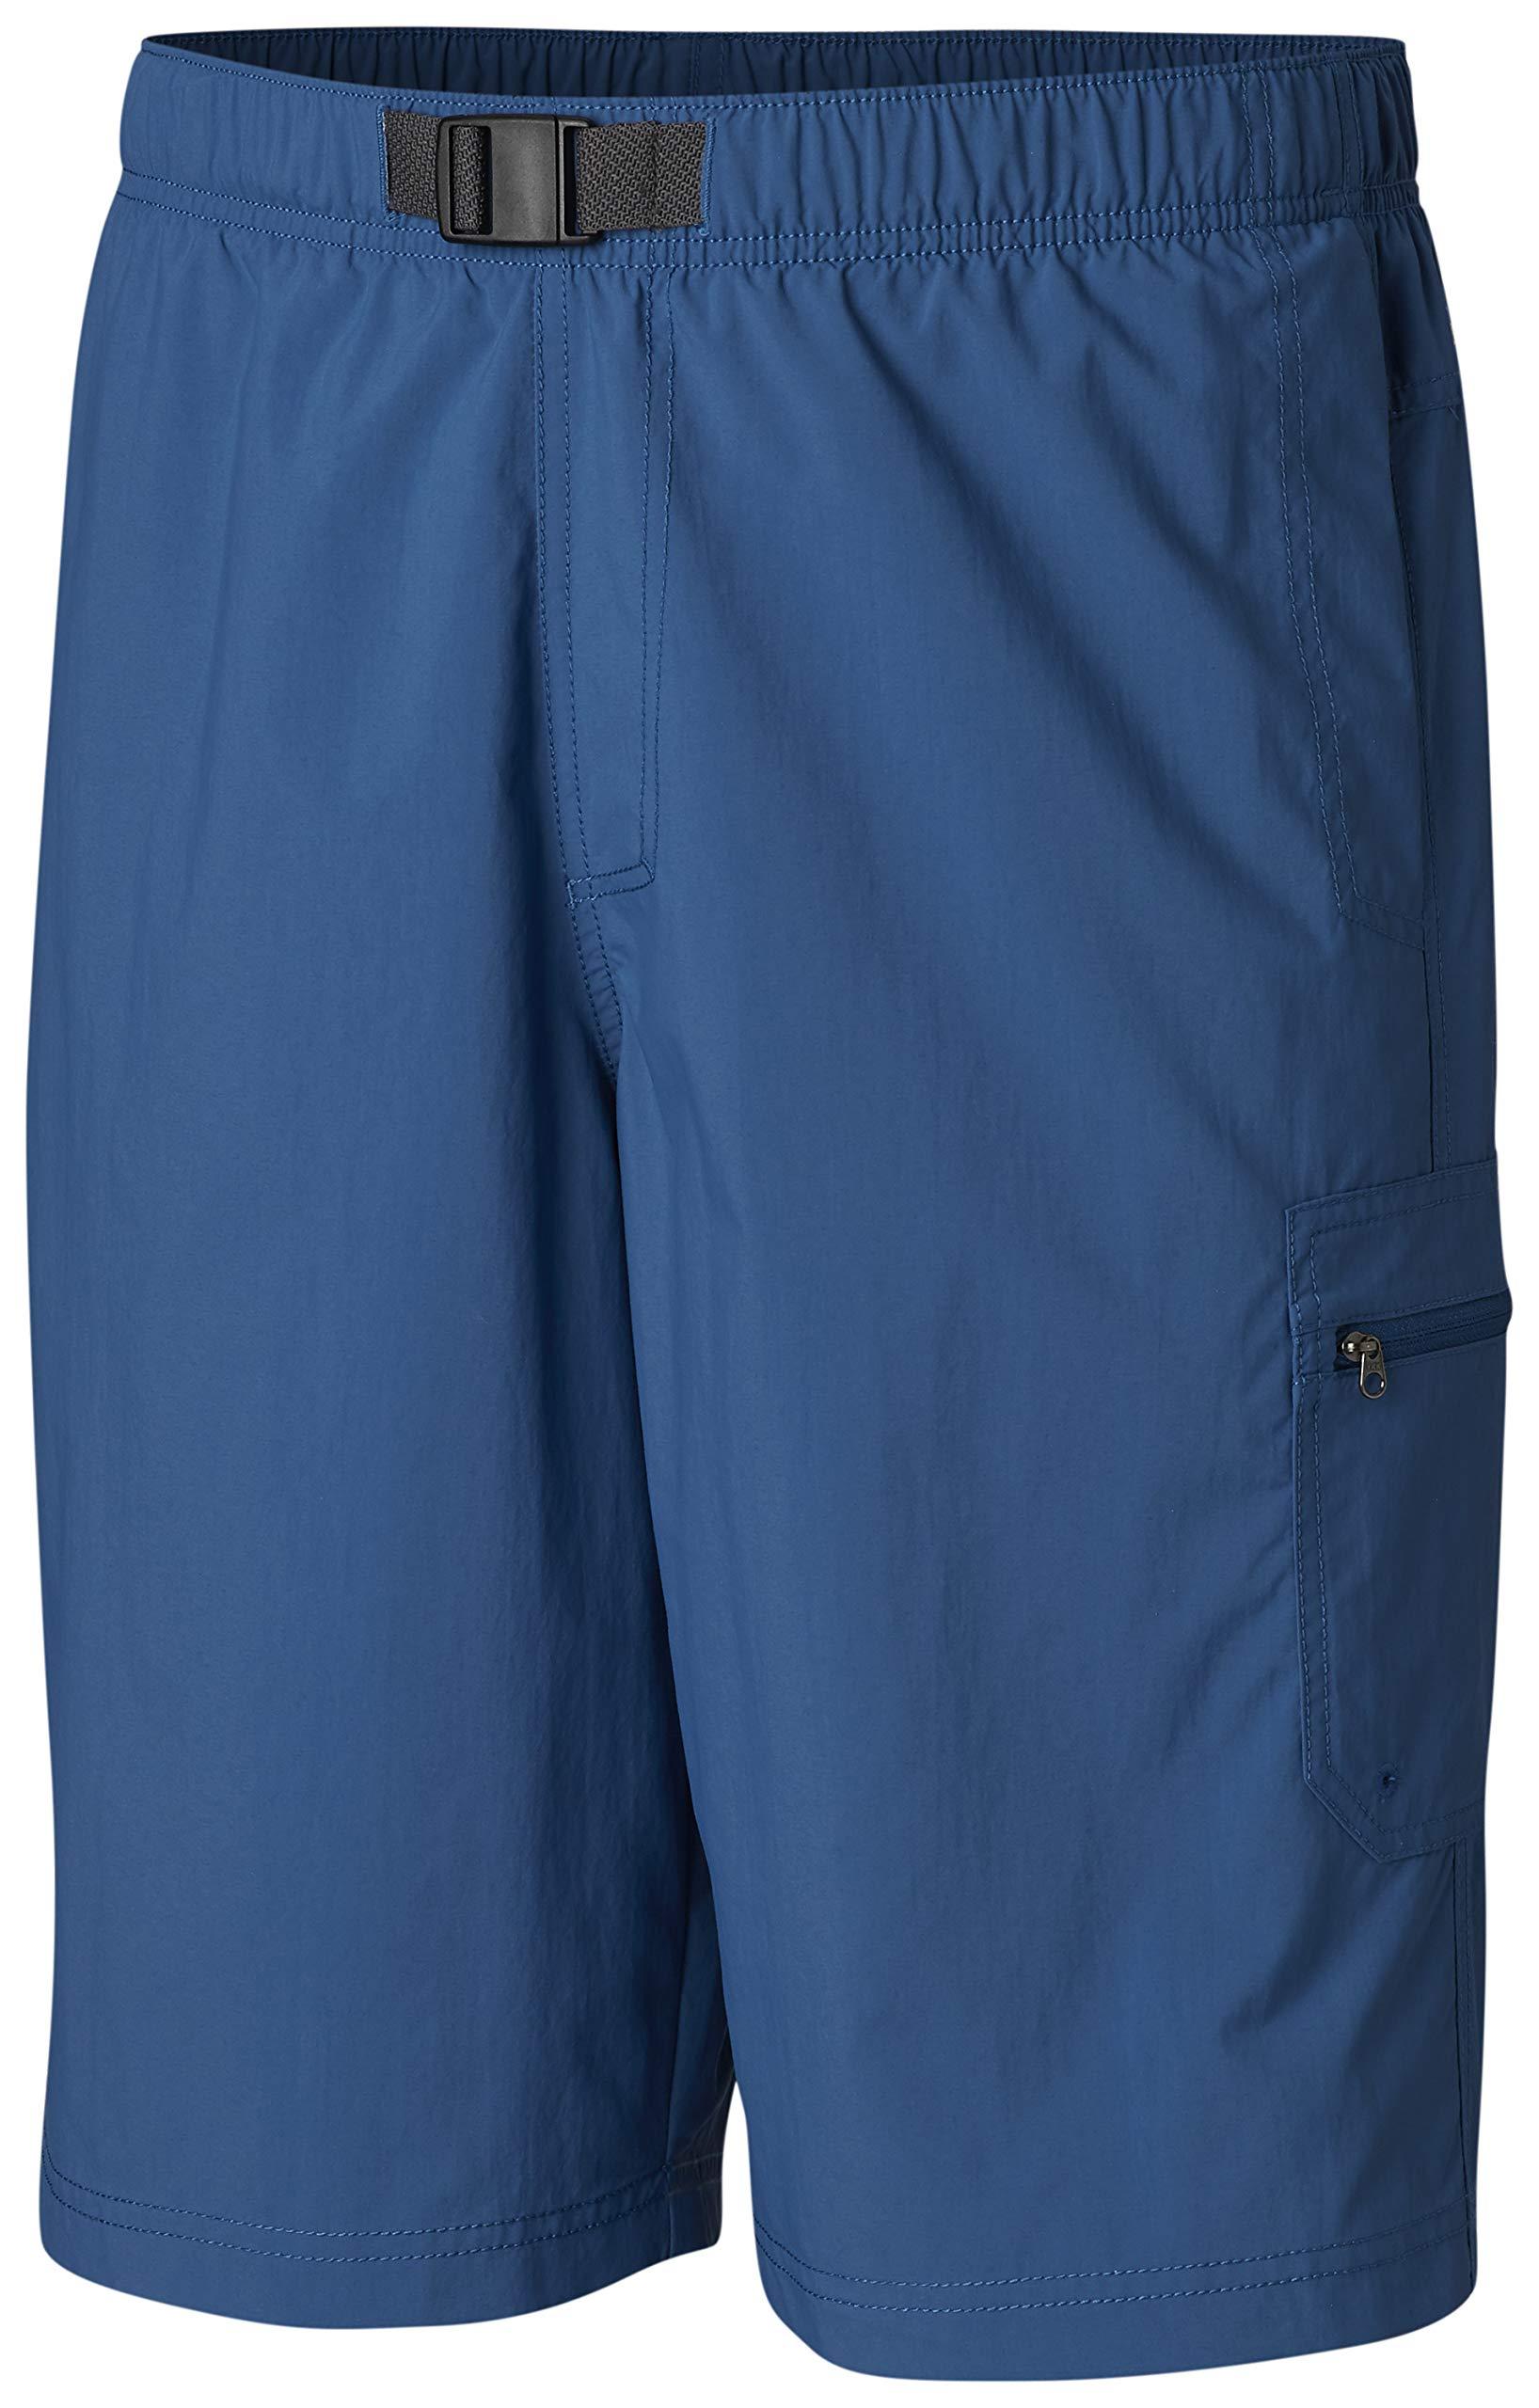 Columbia Men's Palmerston Peak Short, Waterproof, UV Sun Protection, Impulse Blue, 2X x 9'' Inseam by Columbia